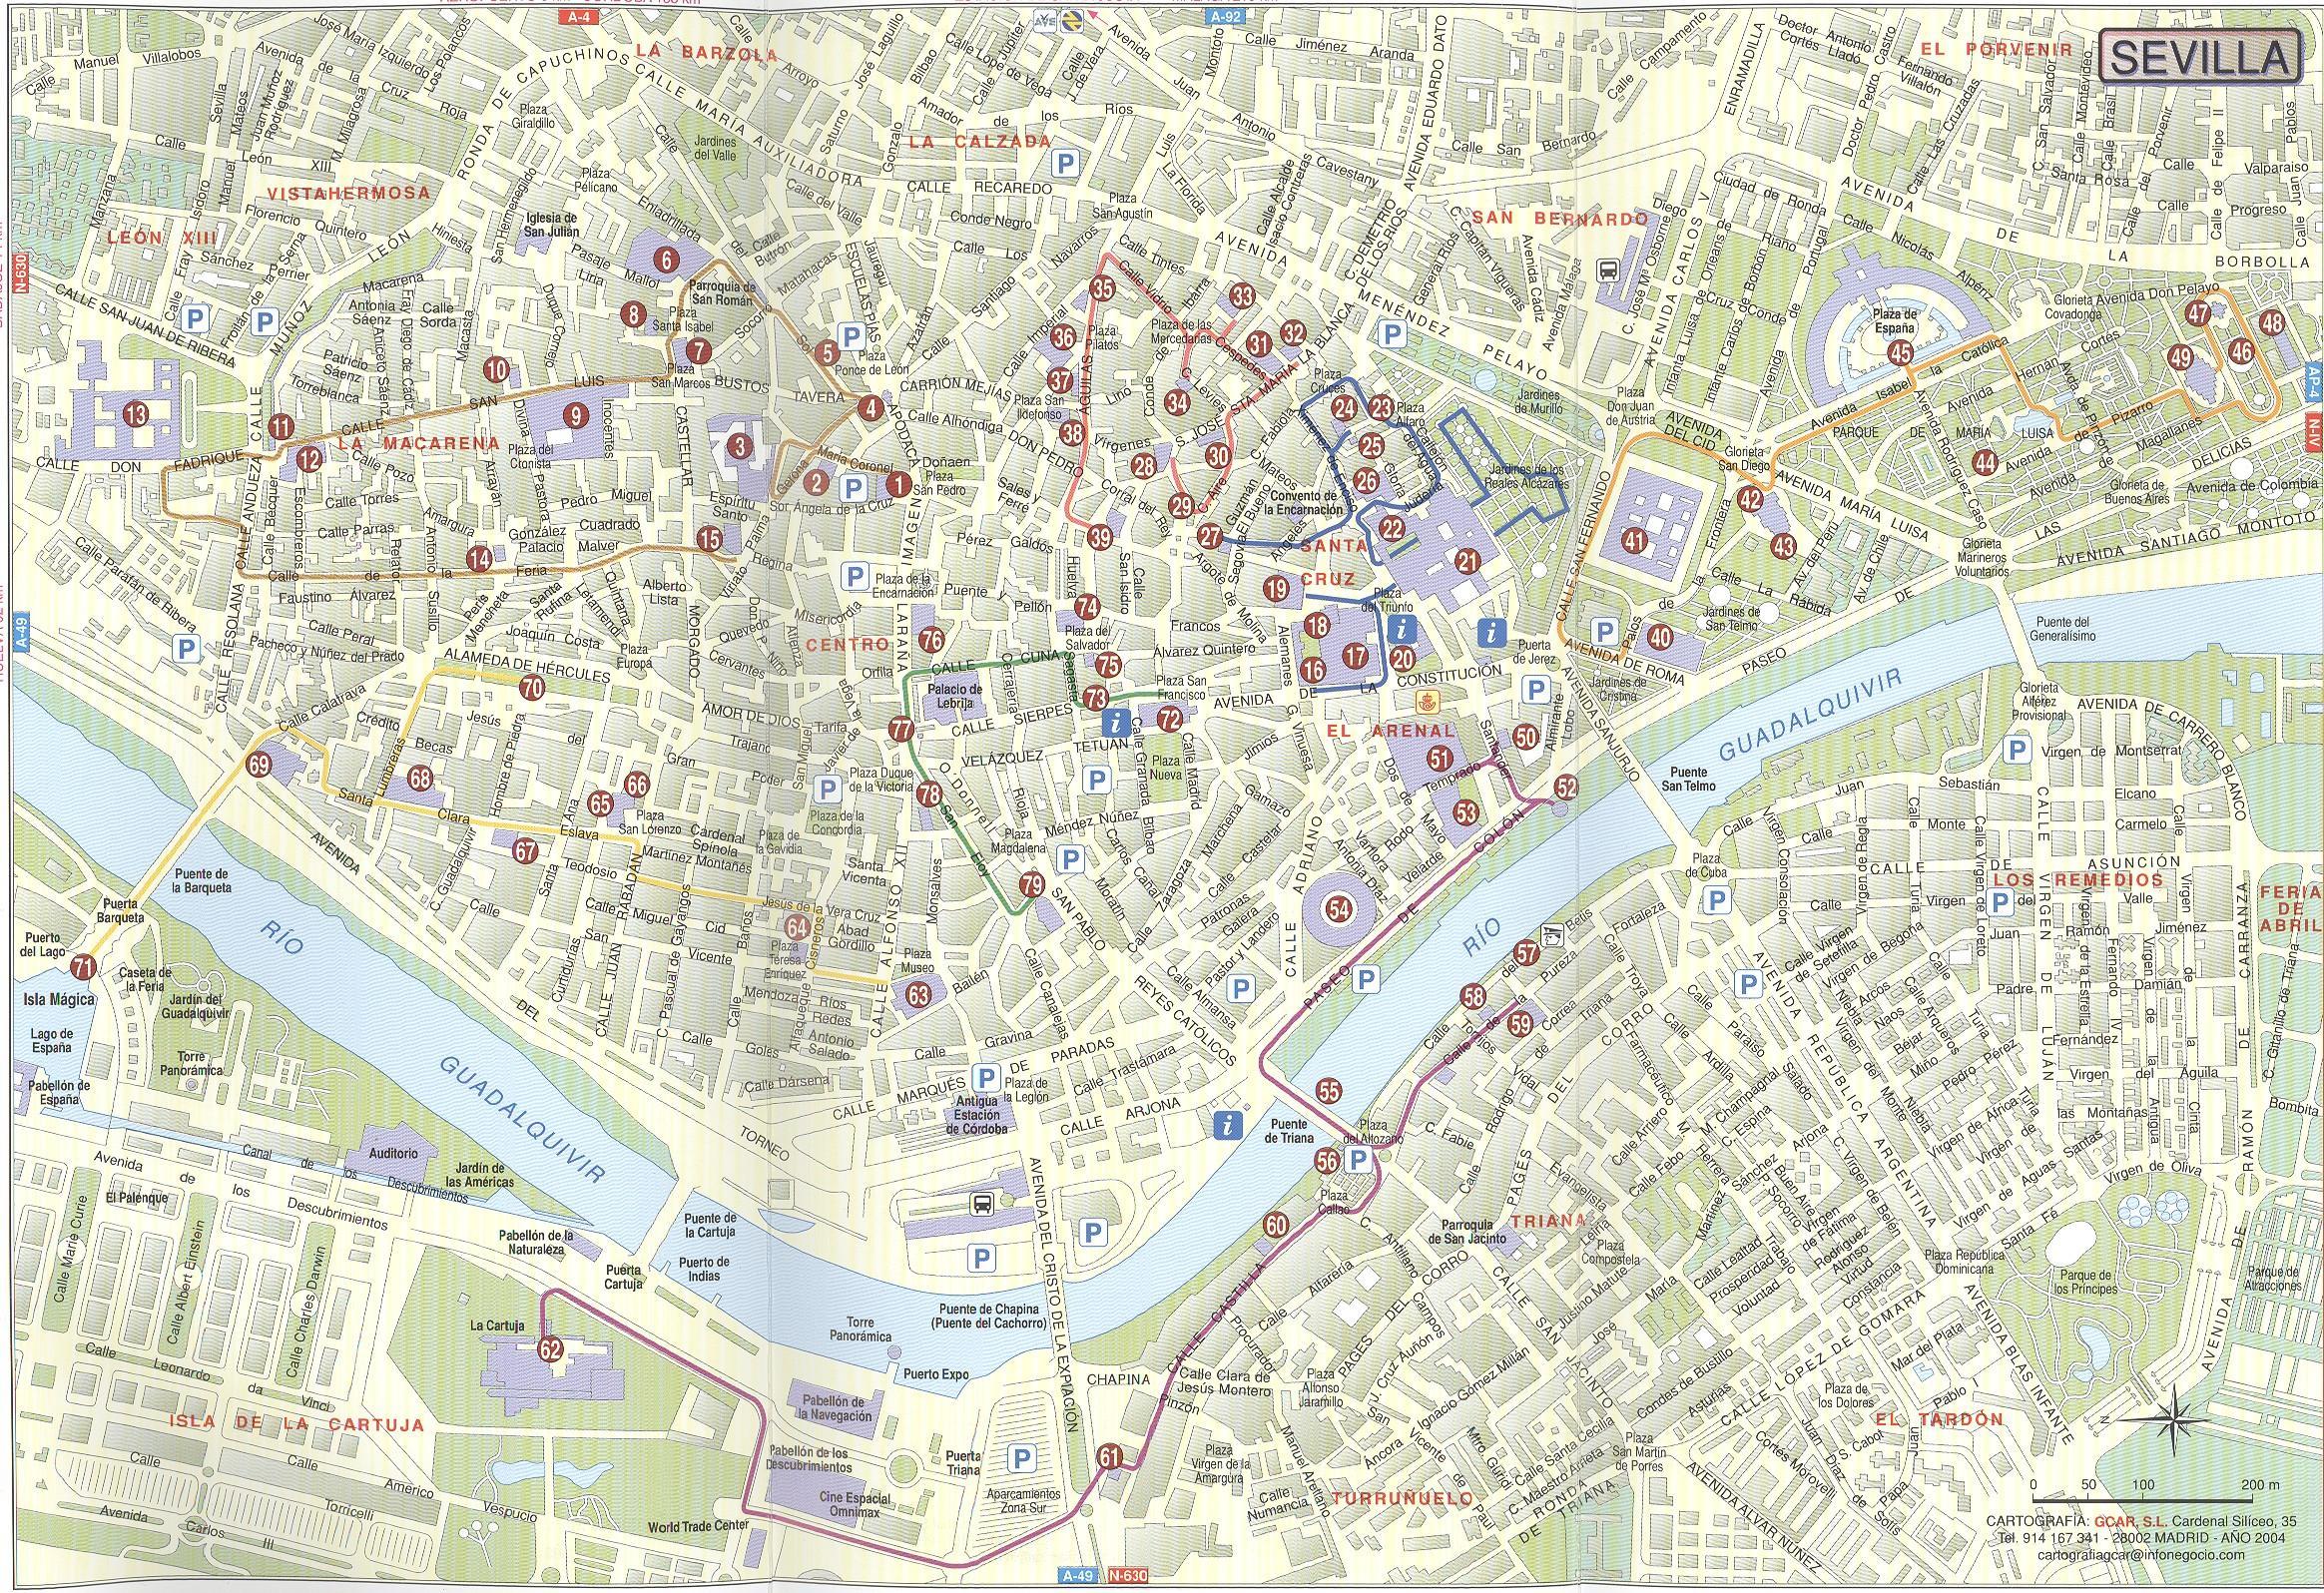 Mapa Callejero De Sevilla.Sevilla Calle Mapa Callejero De Sevilla Espana